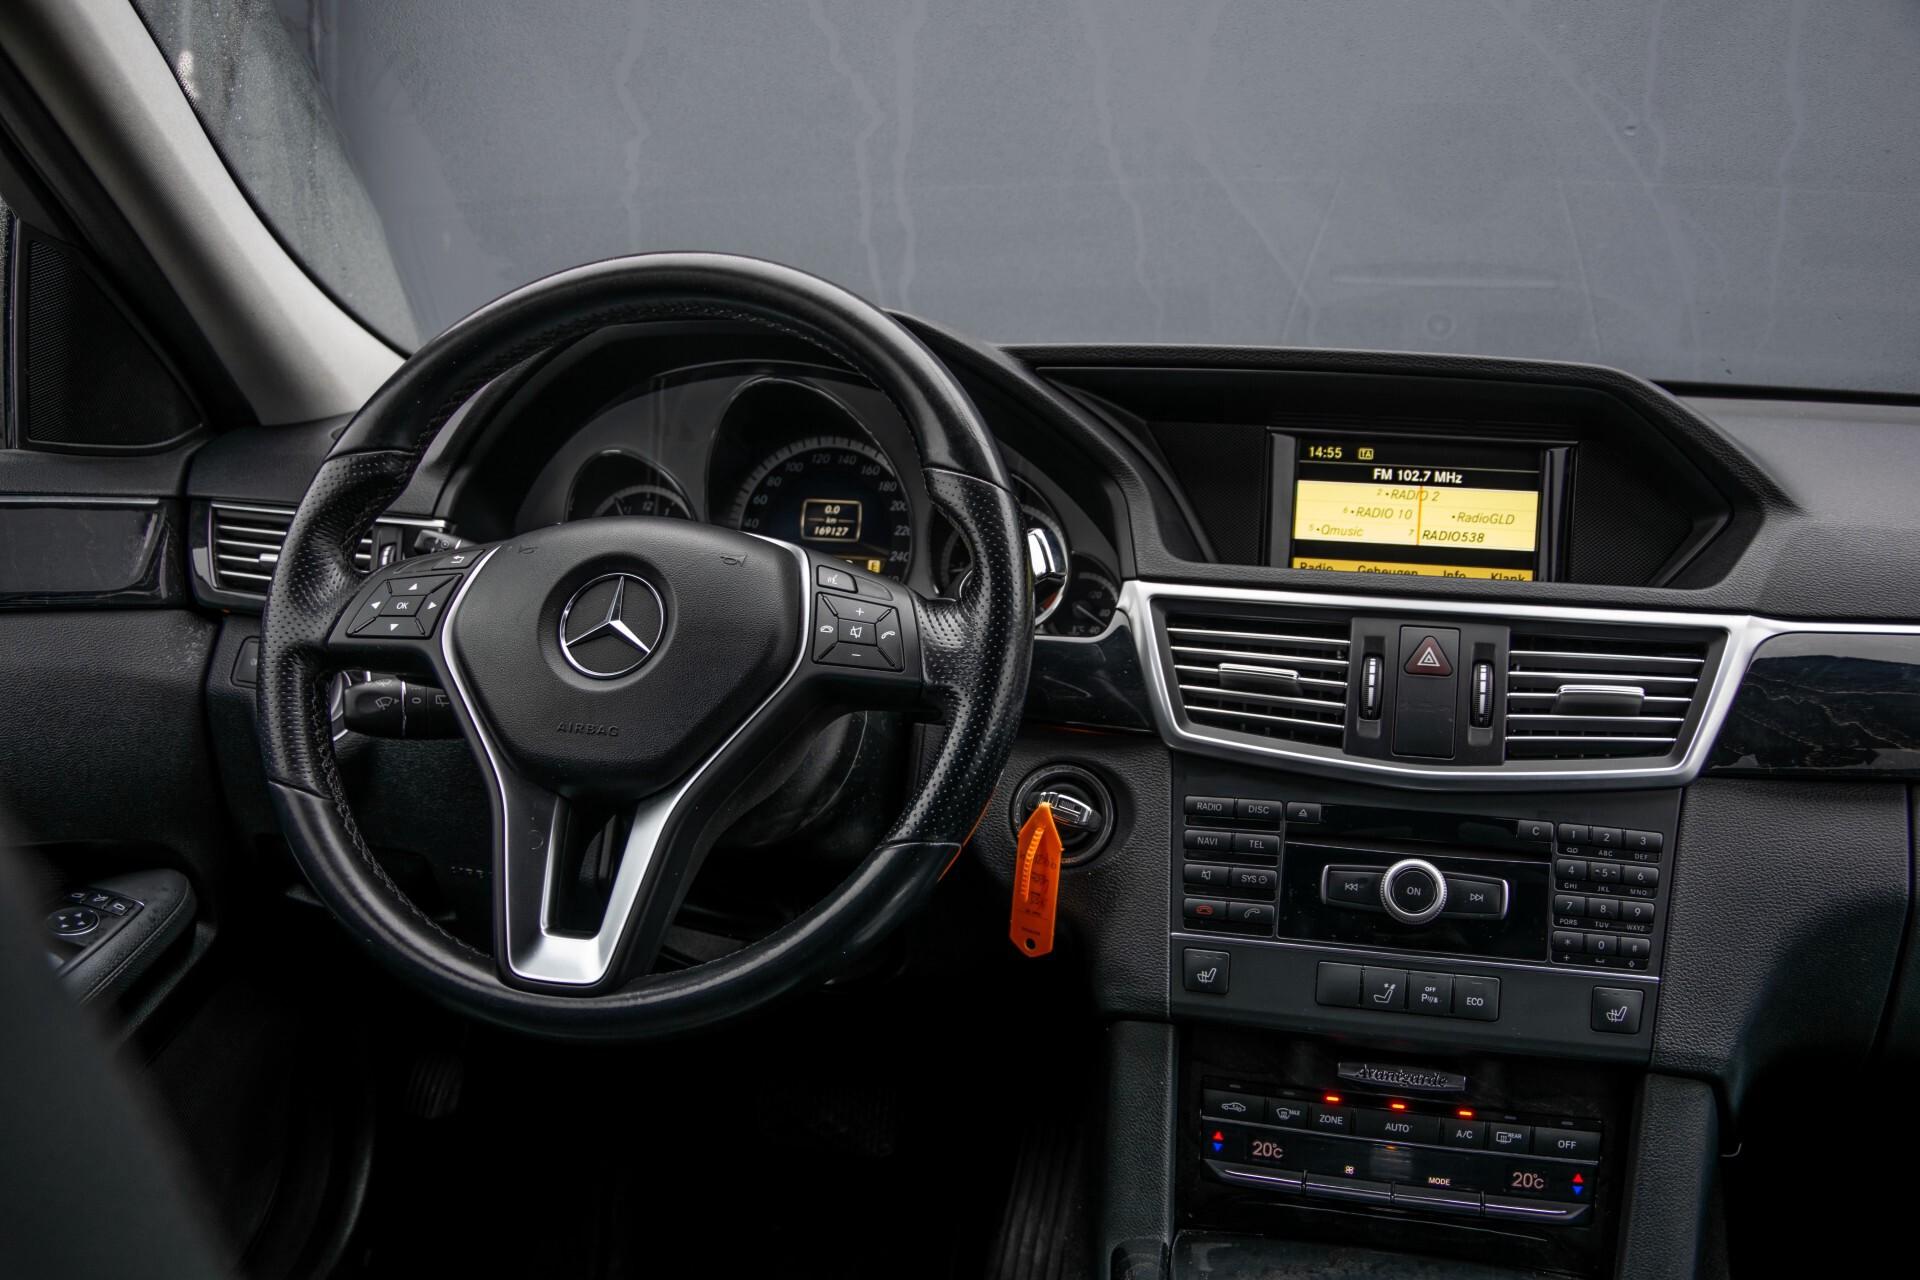 "Mercedes-Benz E-Klasse Estate 220 Cdi Avantgarde Wegklapbare trekhaak/18""/Privacyglas Aut7 Foto 7"